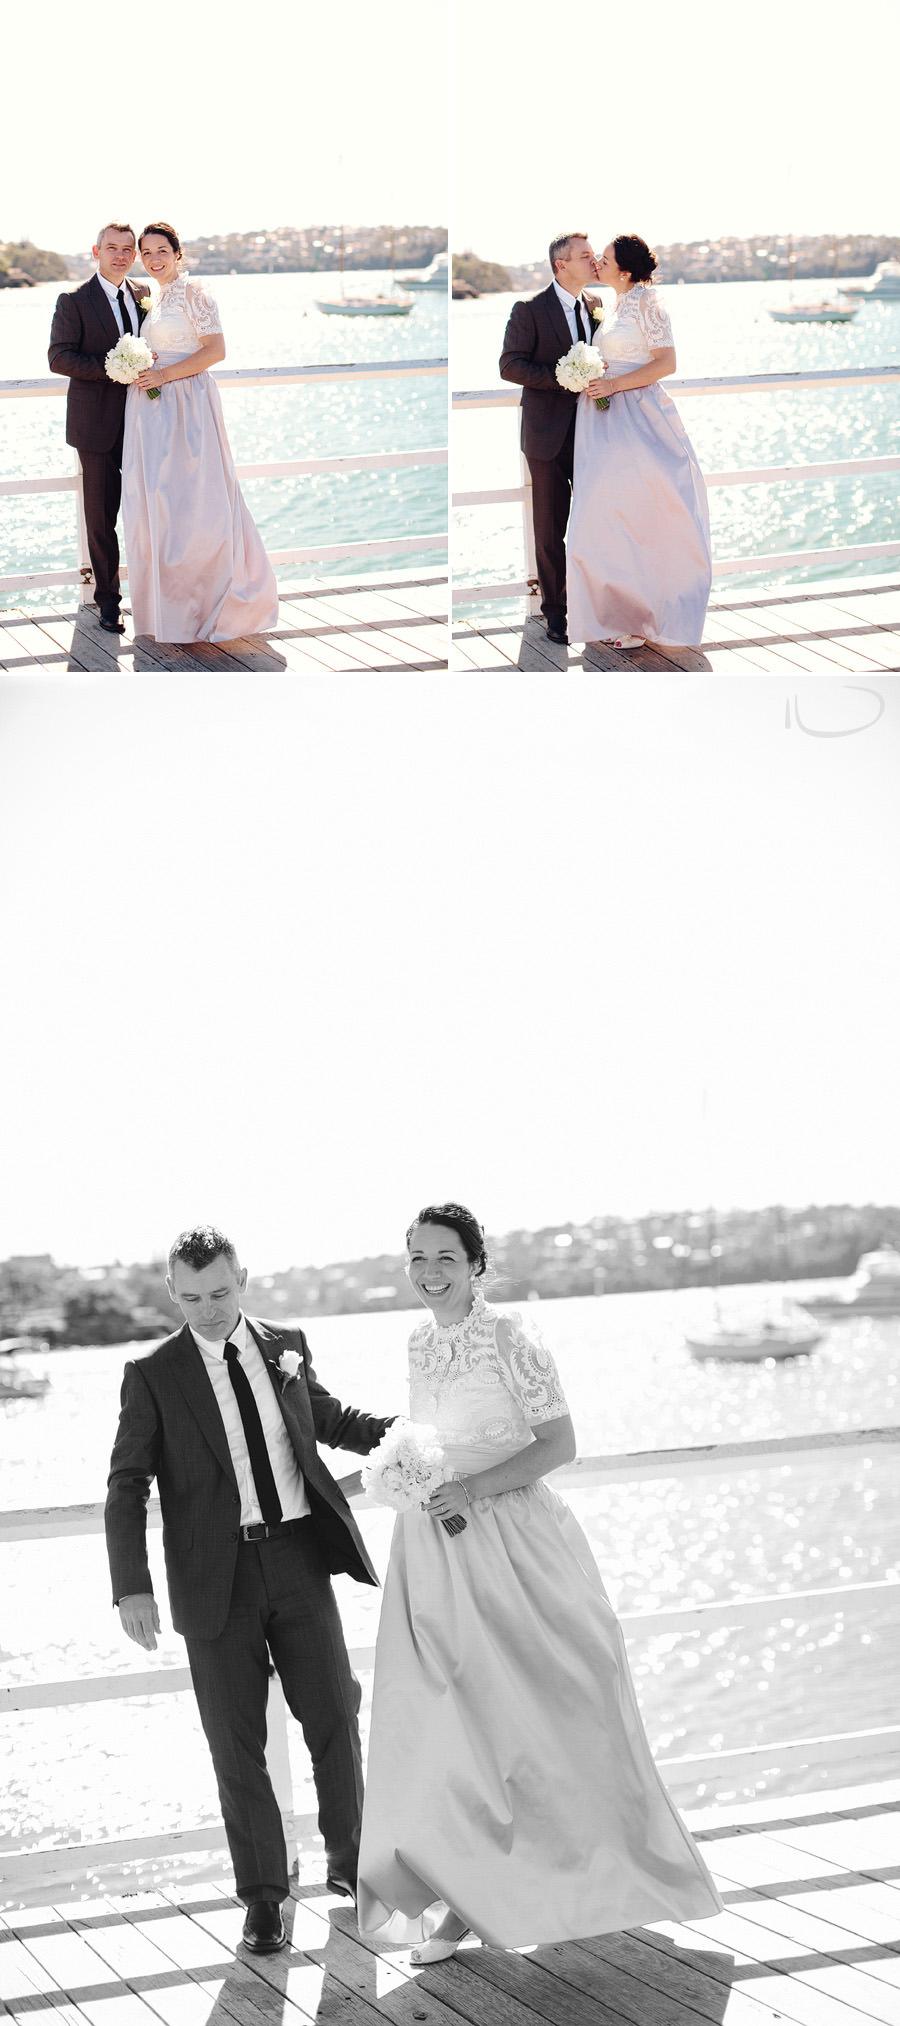 Balmoral Wedding Photography: Waterfront wedding